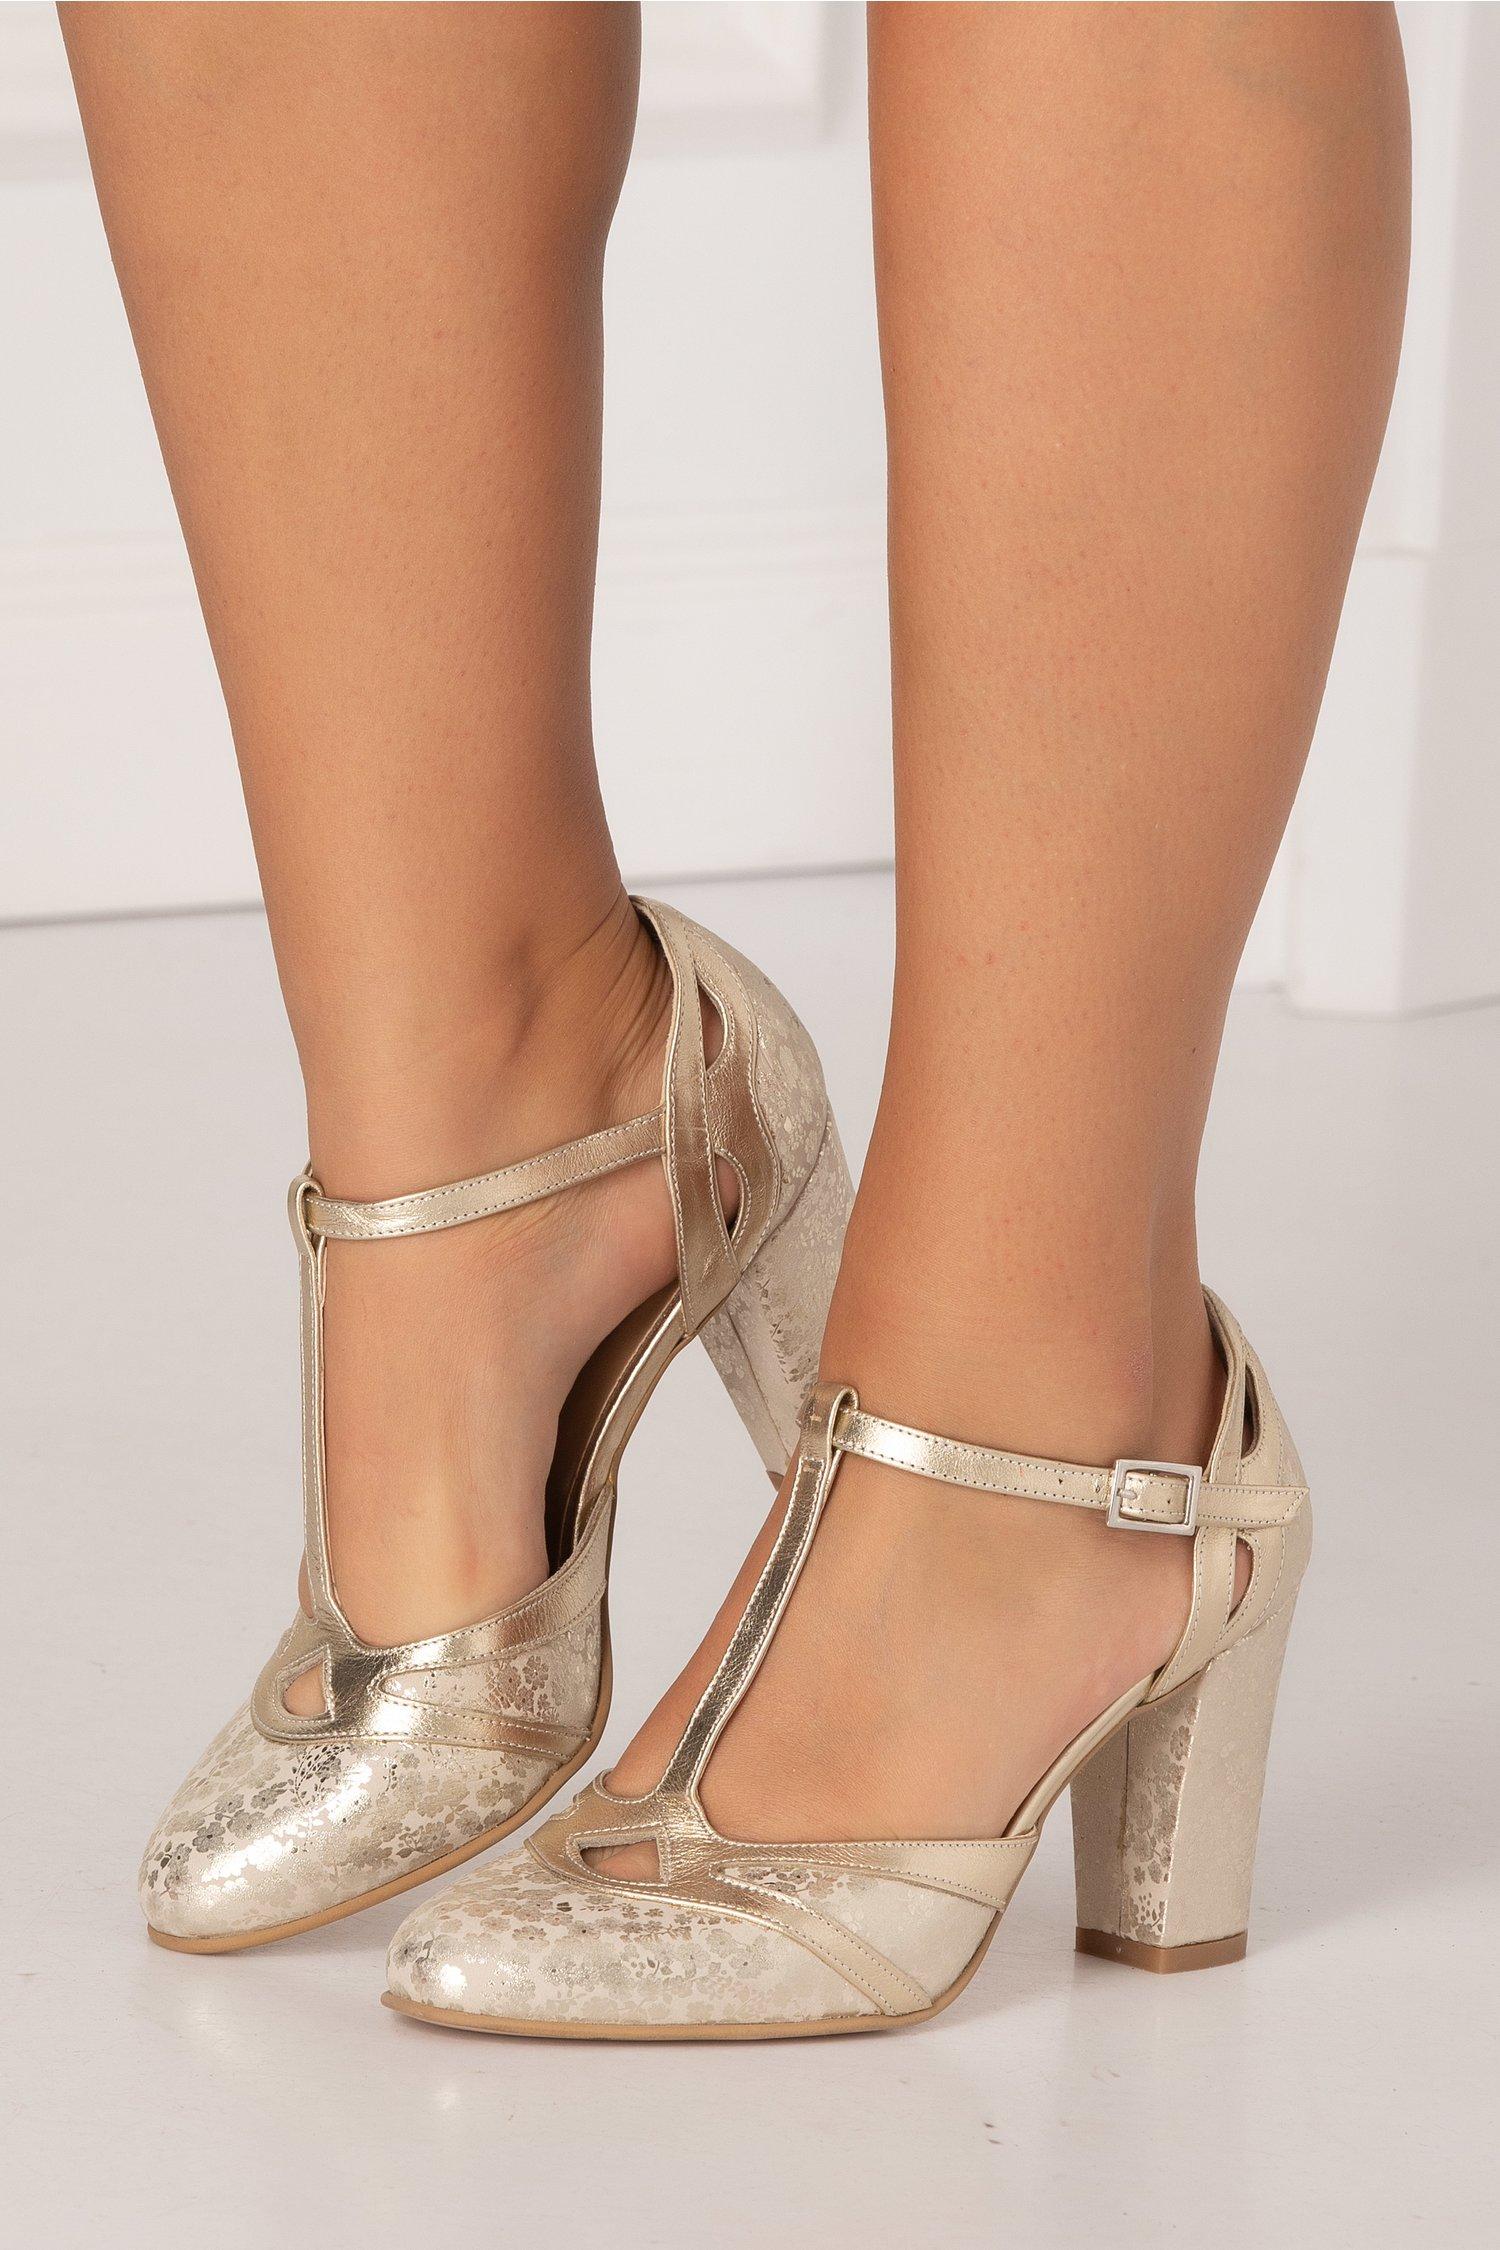 Pantofi aurii cu imprimeu floral cu reflexii metalice